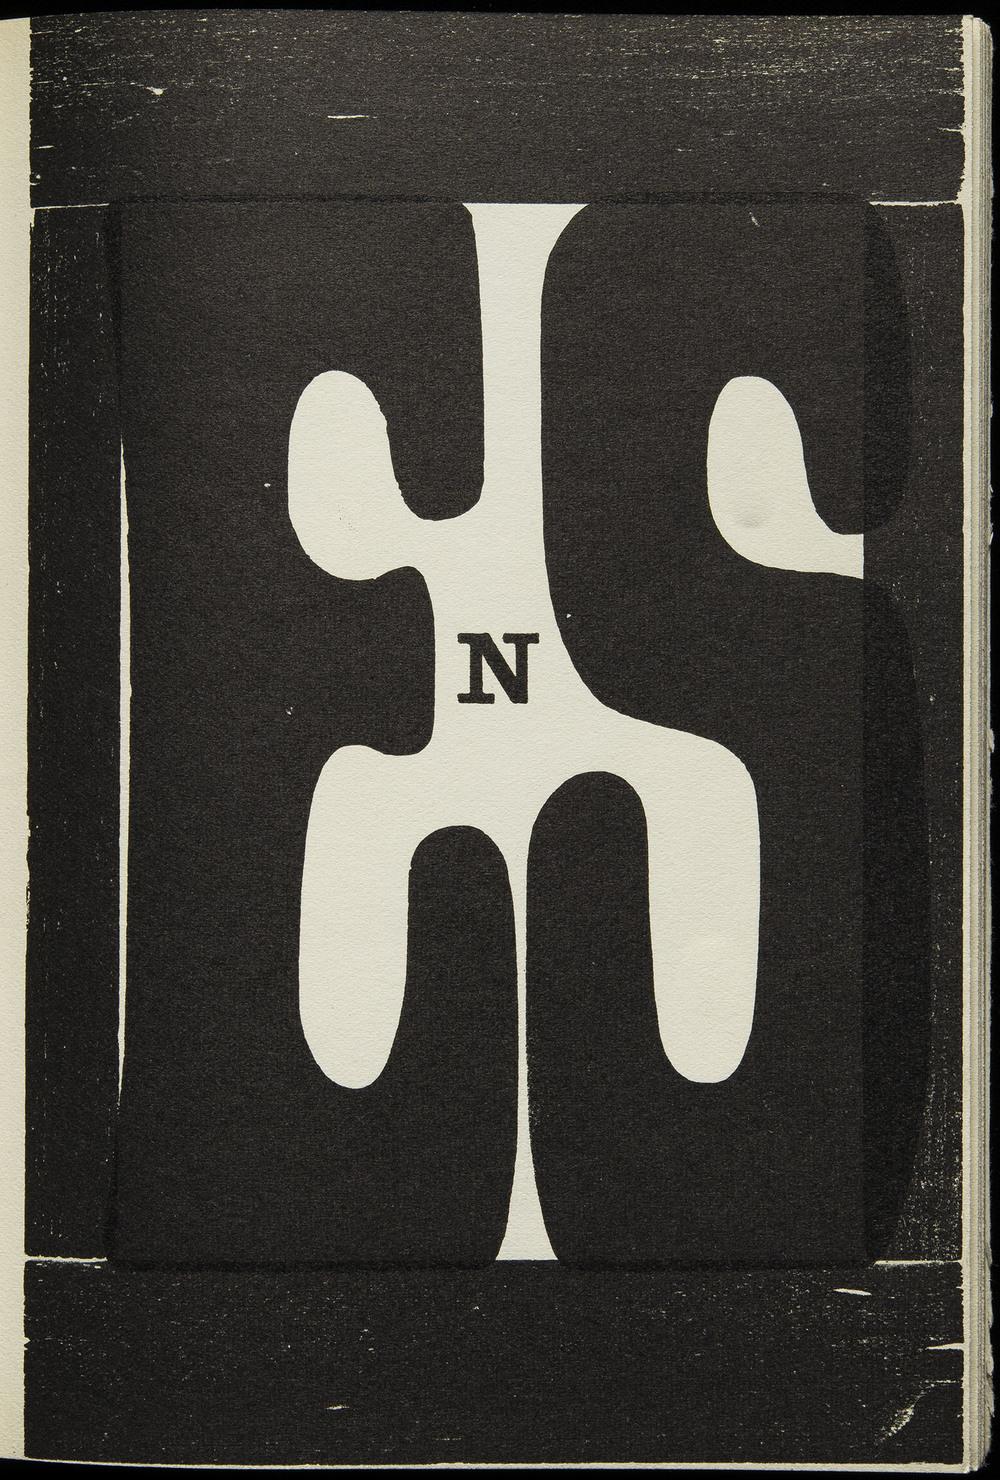 Hap Grieshaber,  Poesia Typographica , Galerie der Spiegel, Cologne, 1962, 15.4 x 21.5 cm